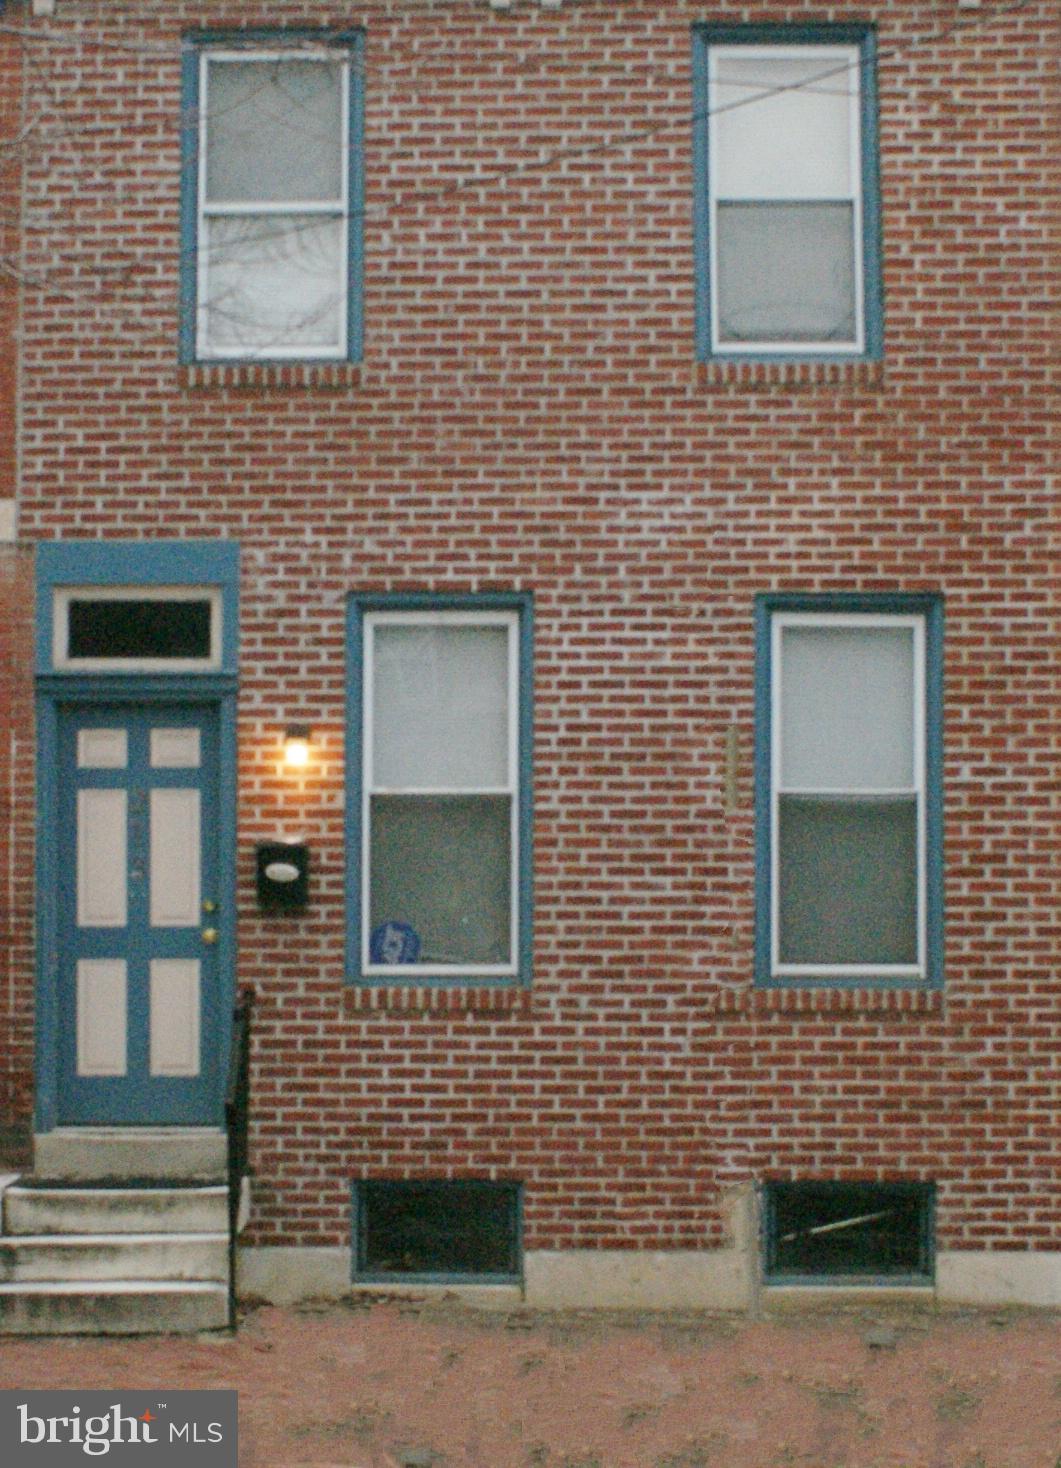 213 ELM STREET, CAMDEN, NJ 08102